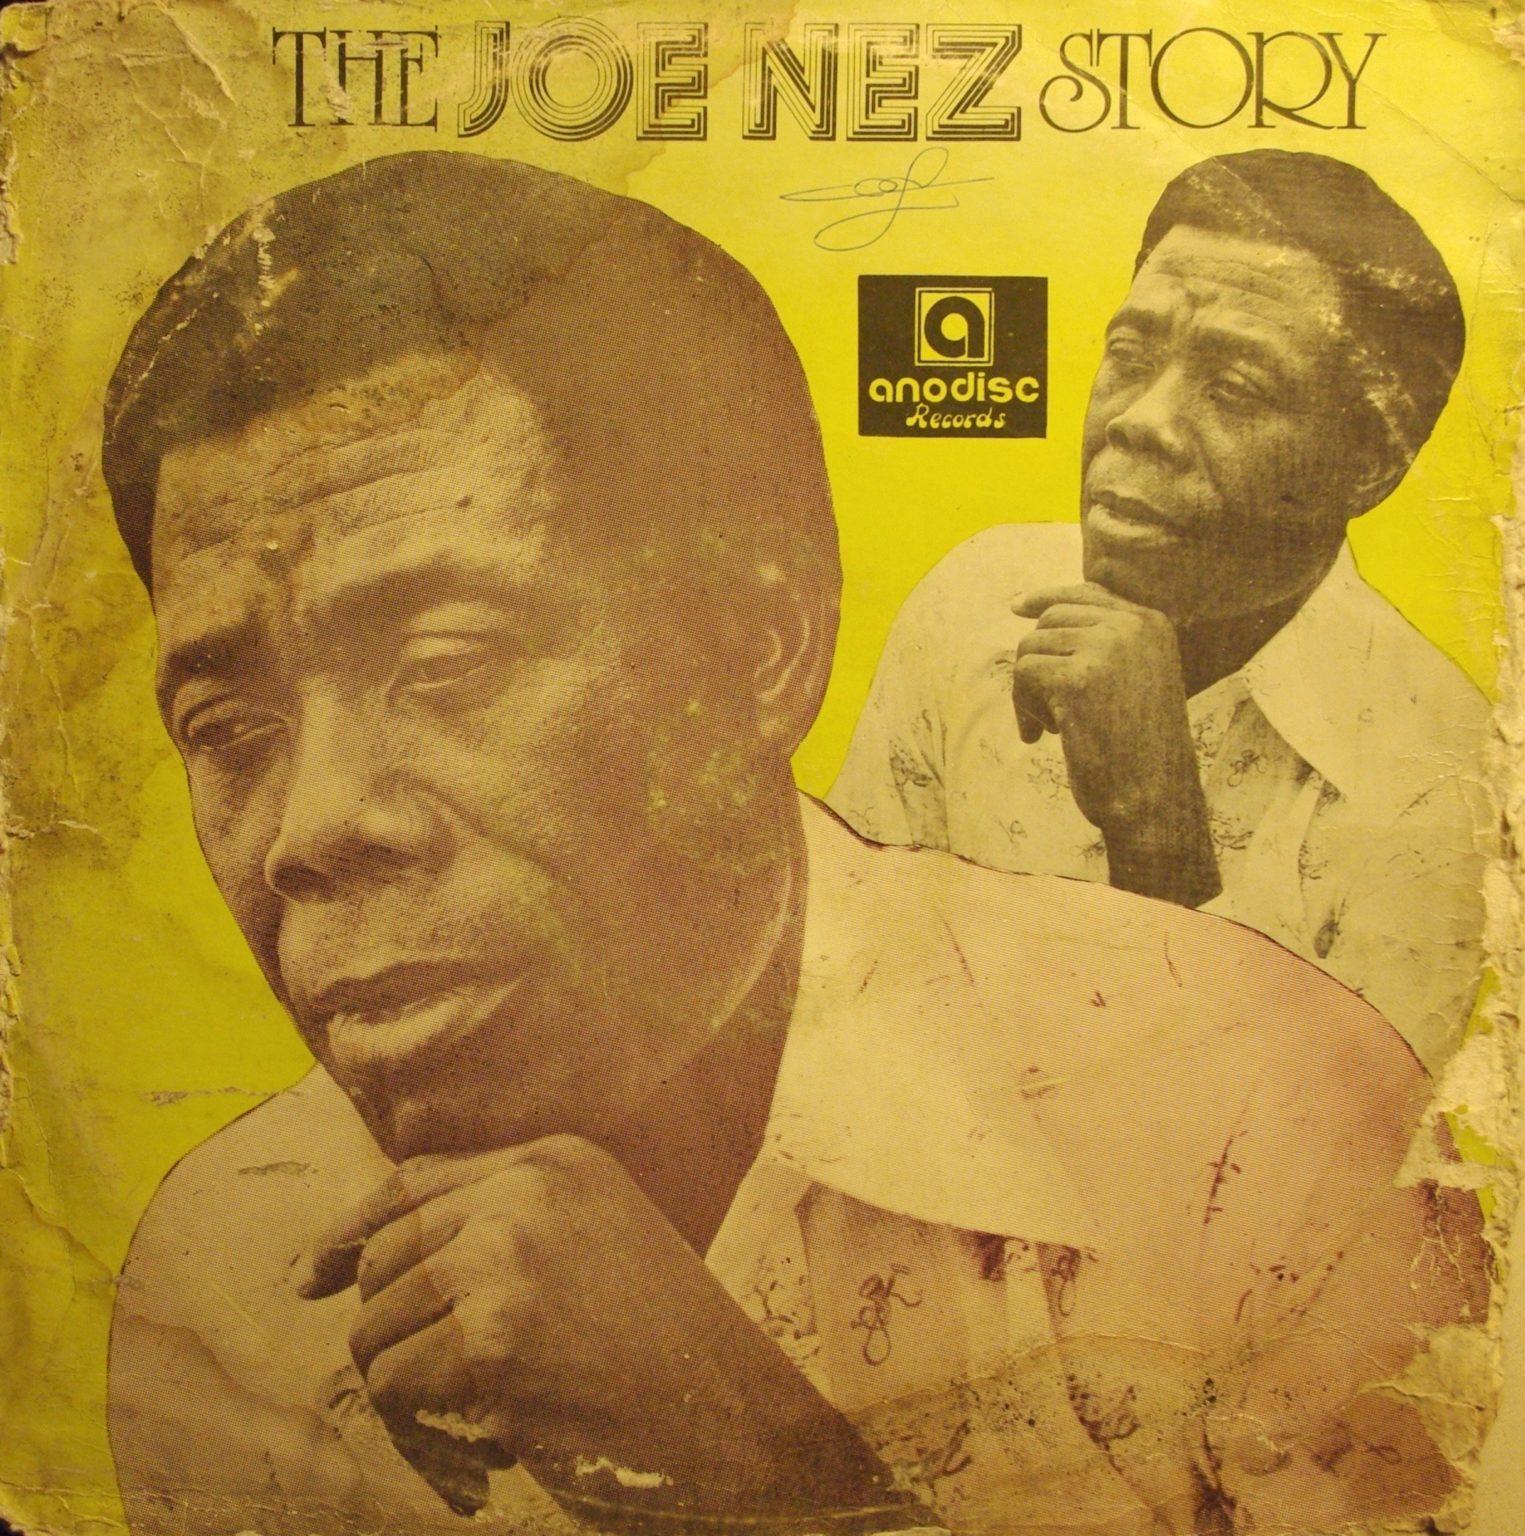 Joe Nez & His Top Six – The Joe Nez Story NIGERIAN Highlife Music Album 1976